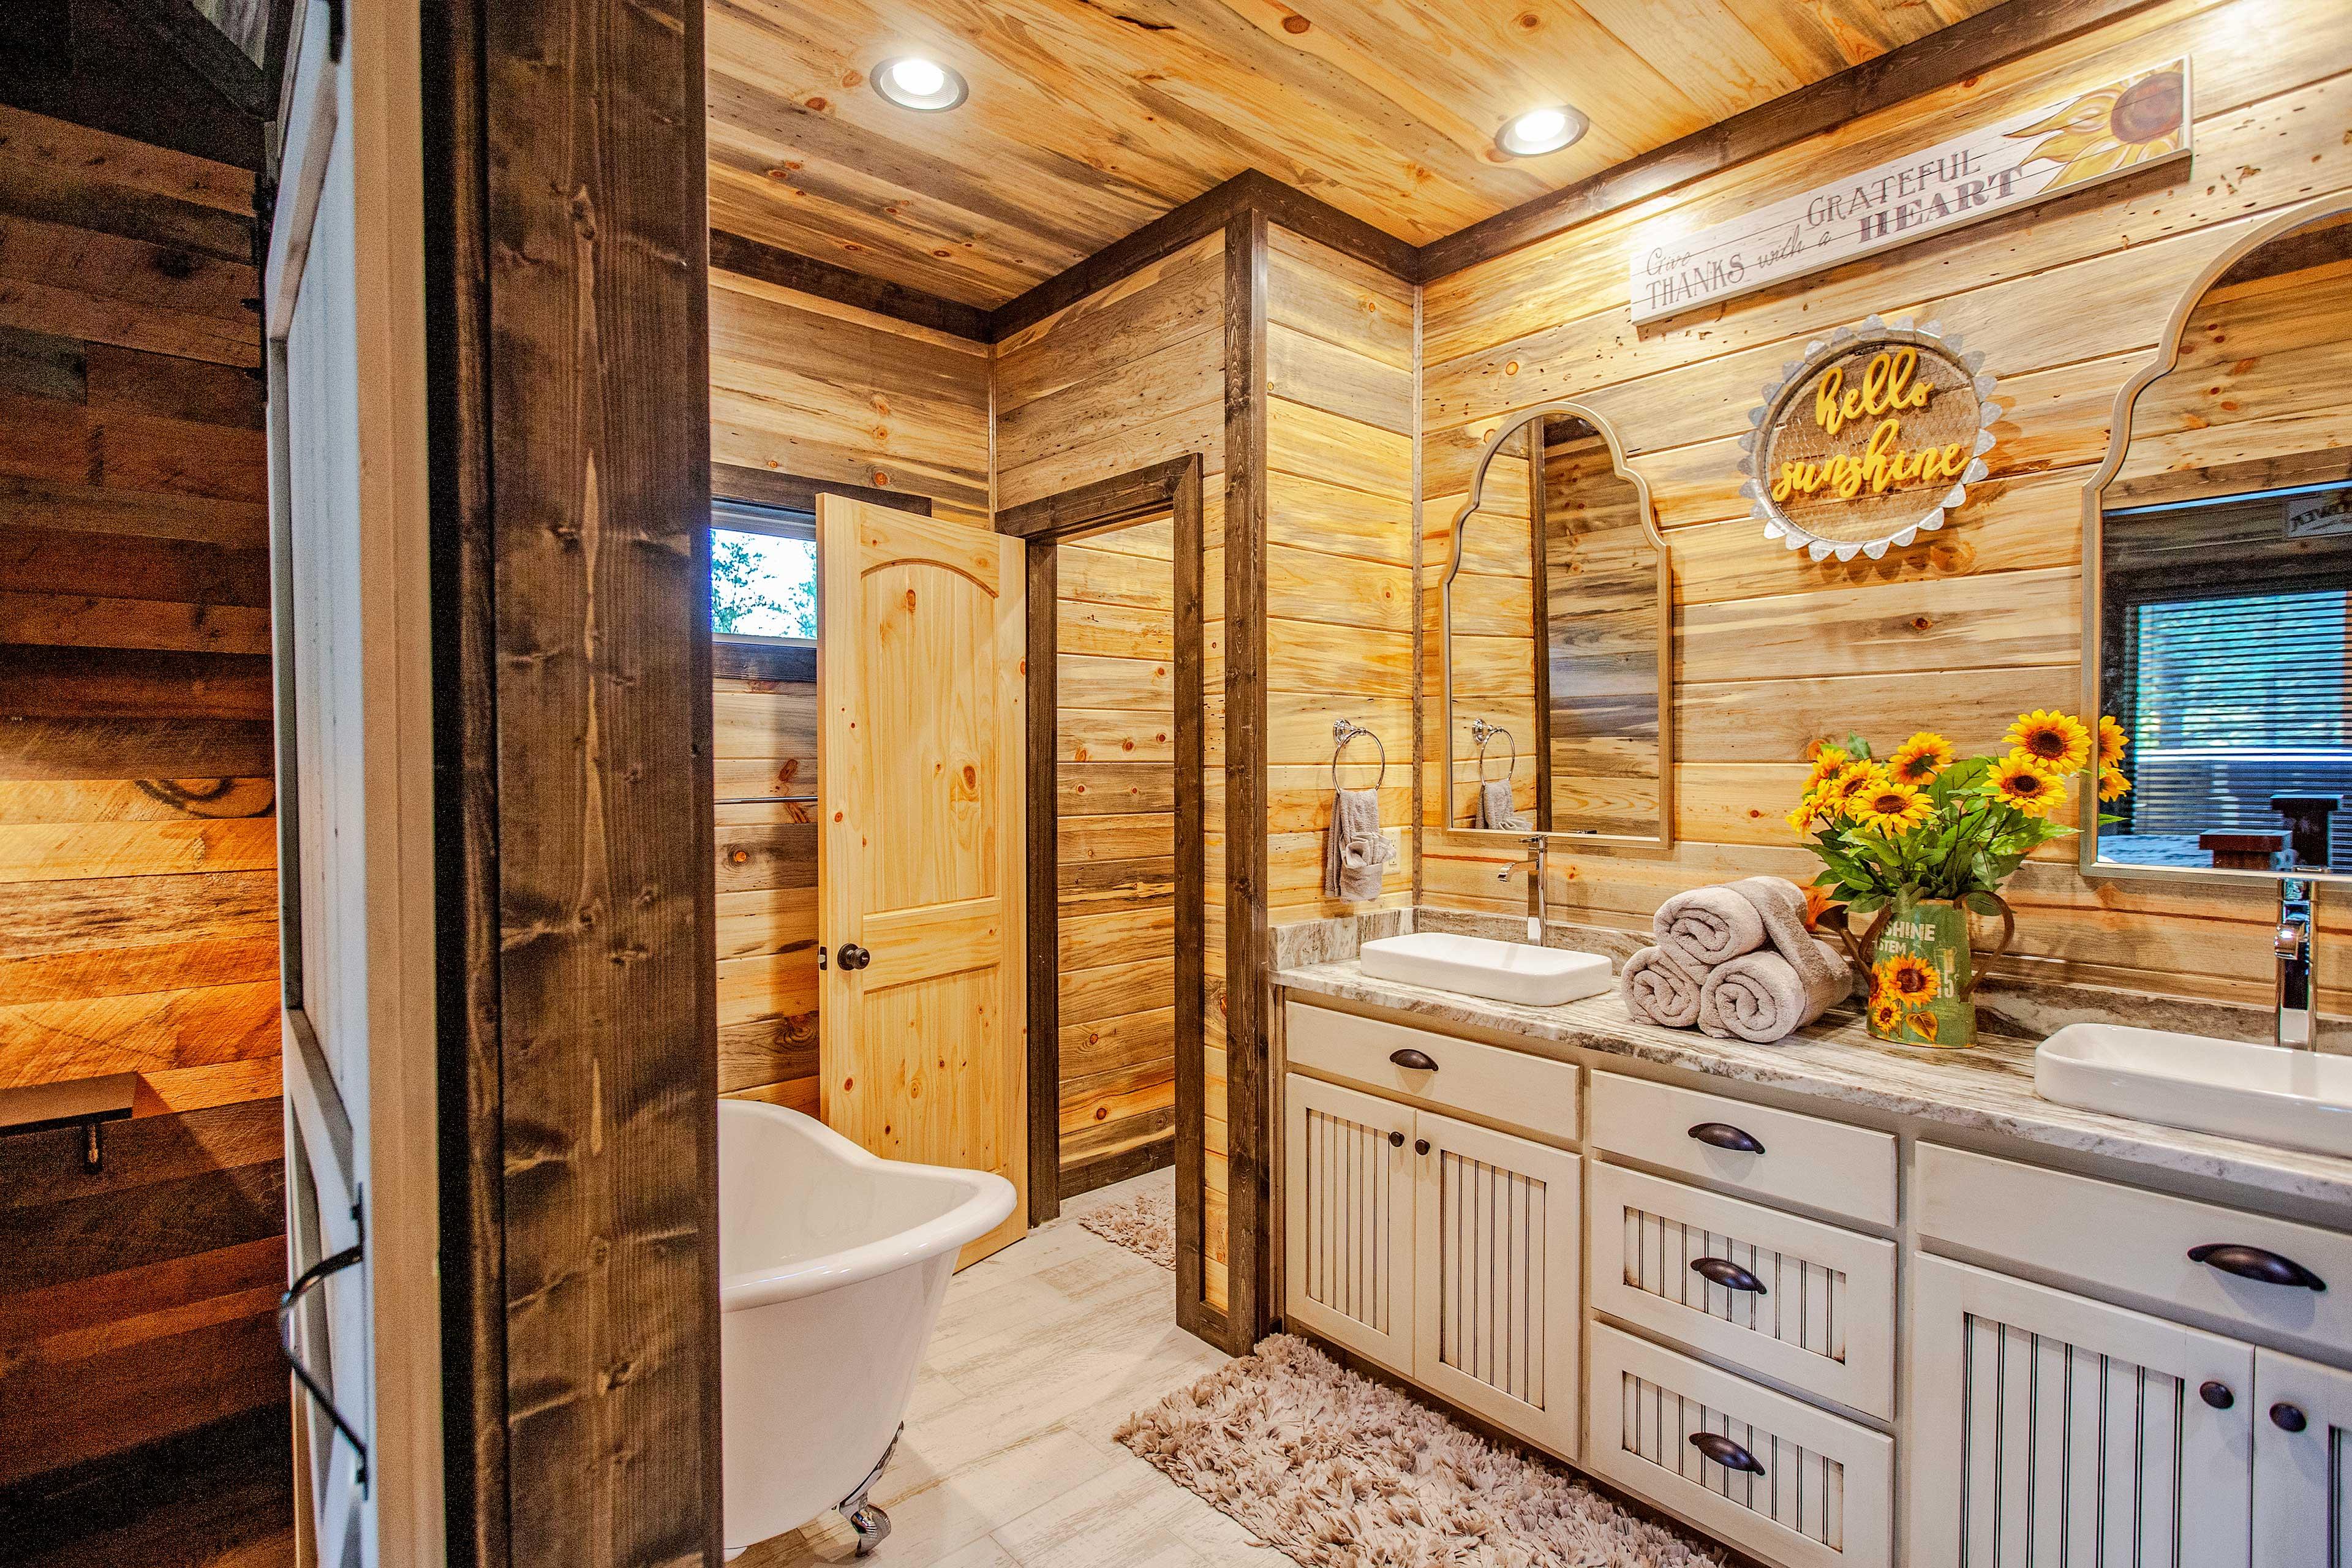 All 4 bedrooms boast private en-suite baths.